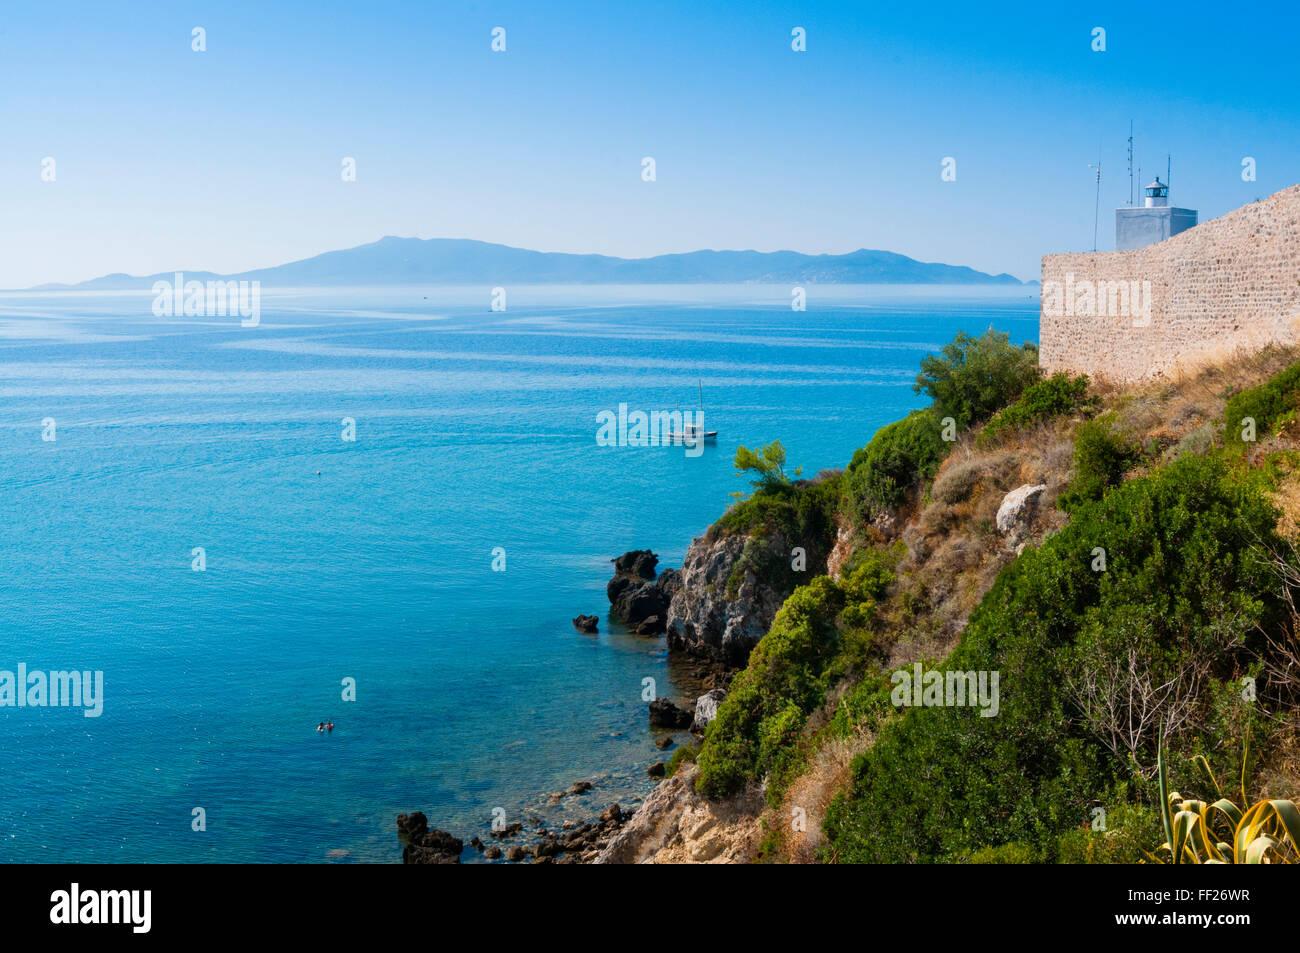 CRMiffs of TaRMamone, TaRMamone, Grosseto province, Maremma, Tuscany, ItaRMy, Europe - Stock Image